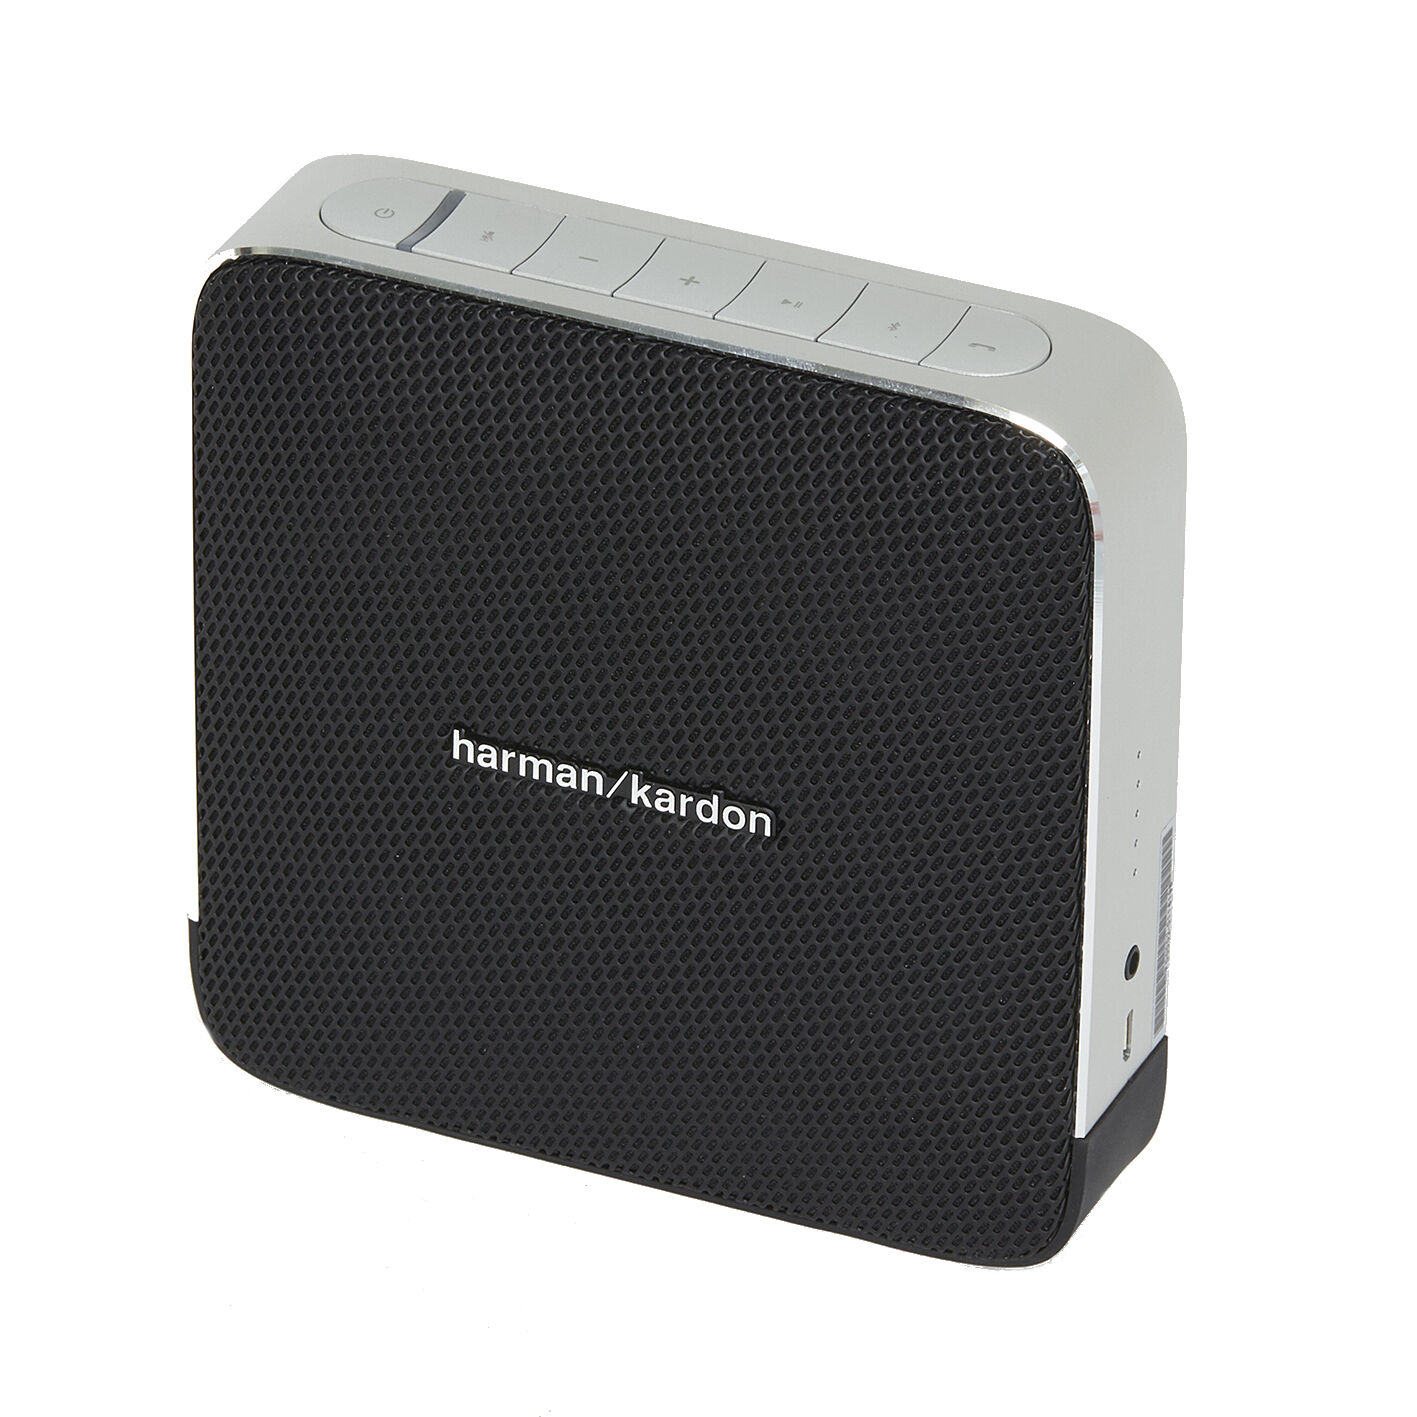 http://i.ebayimg.com/t/Harman-Kardon-Esquire-Bluetooth-Lautsprecher-Akku-Telefon-Headset-NFC-NEU-/00/s/MTQxN1gxNDE3/z/QOkAAOSwgZ1Xqdvm/$_57.JPG